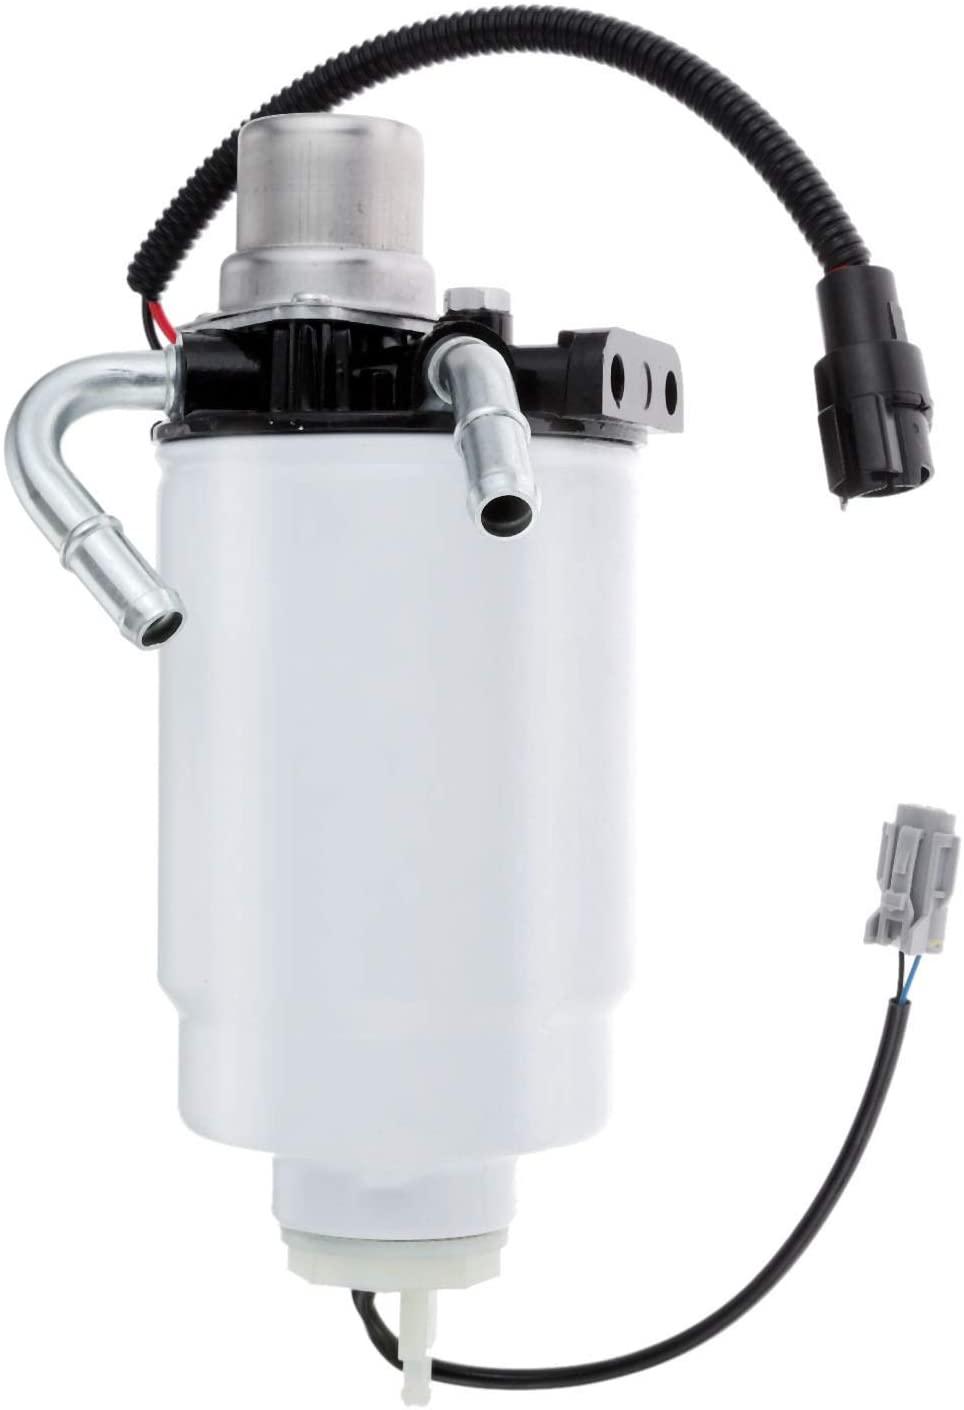 Aupoko 12642623 Fuel Filter Head for Duramax Fuel Filter Housing, 6.6 Duramax Fuel Filter Assembly Replace# 12642623, TP3018, 12639277, Fit for GMC Sierra Chevrolet Silverado 2500 HD 3500 HD